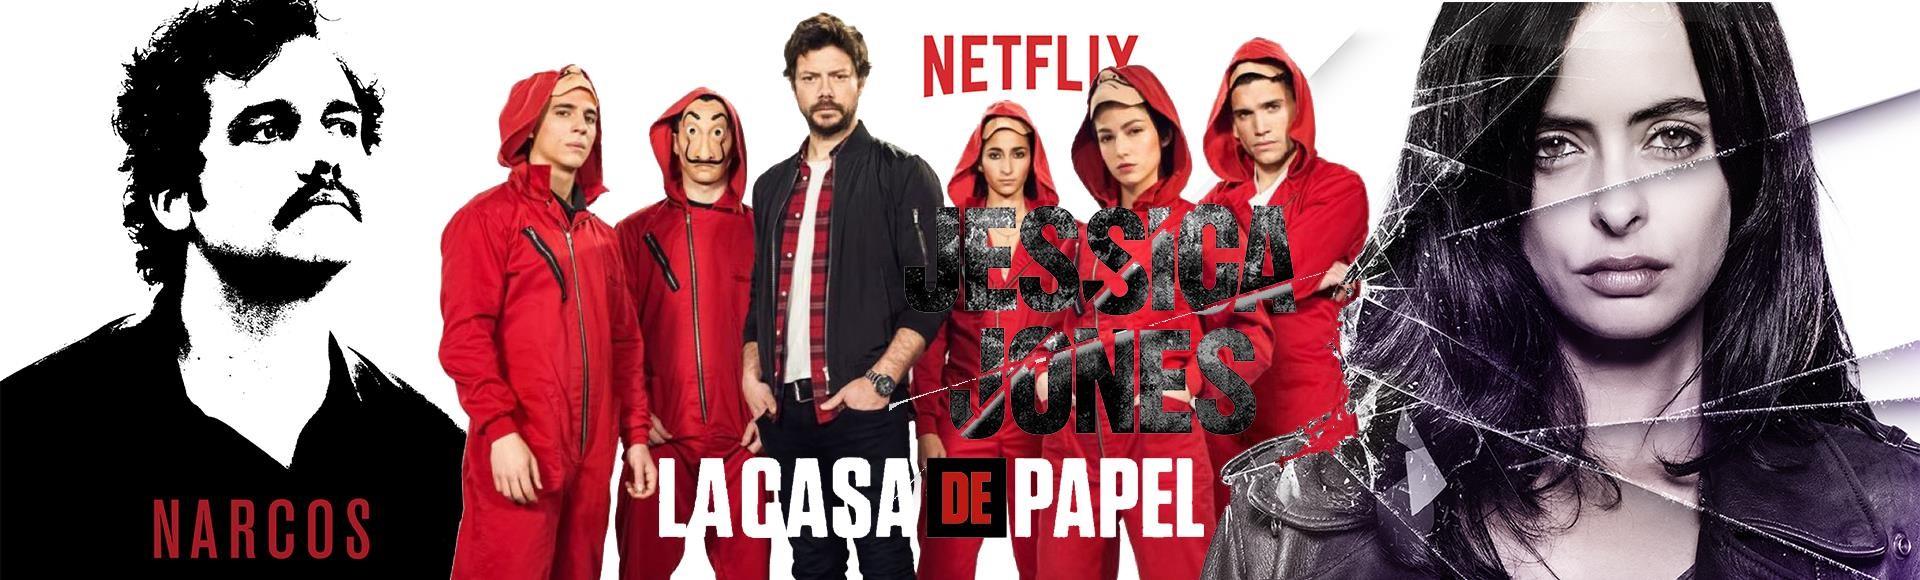 Netflix-puhutv-blutv